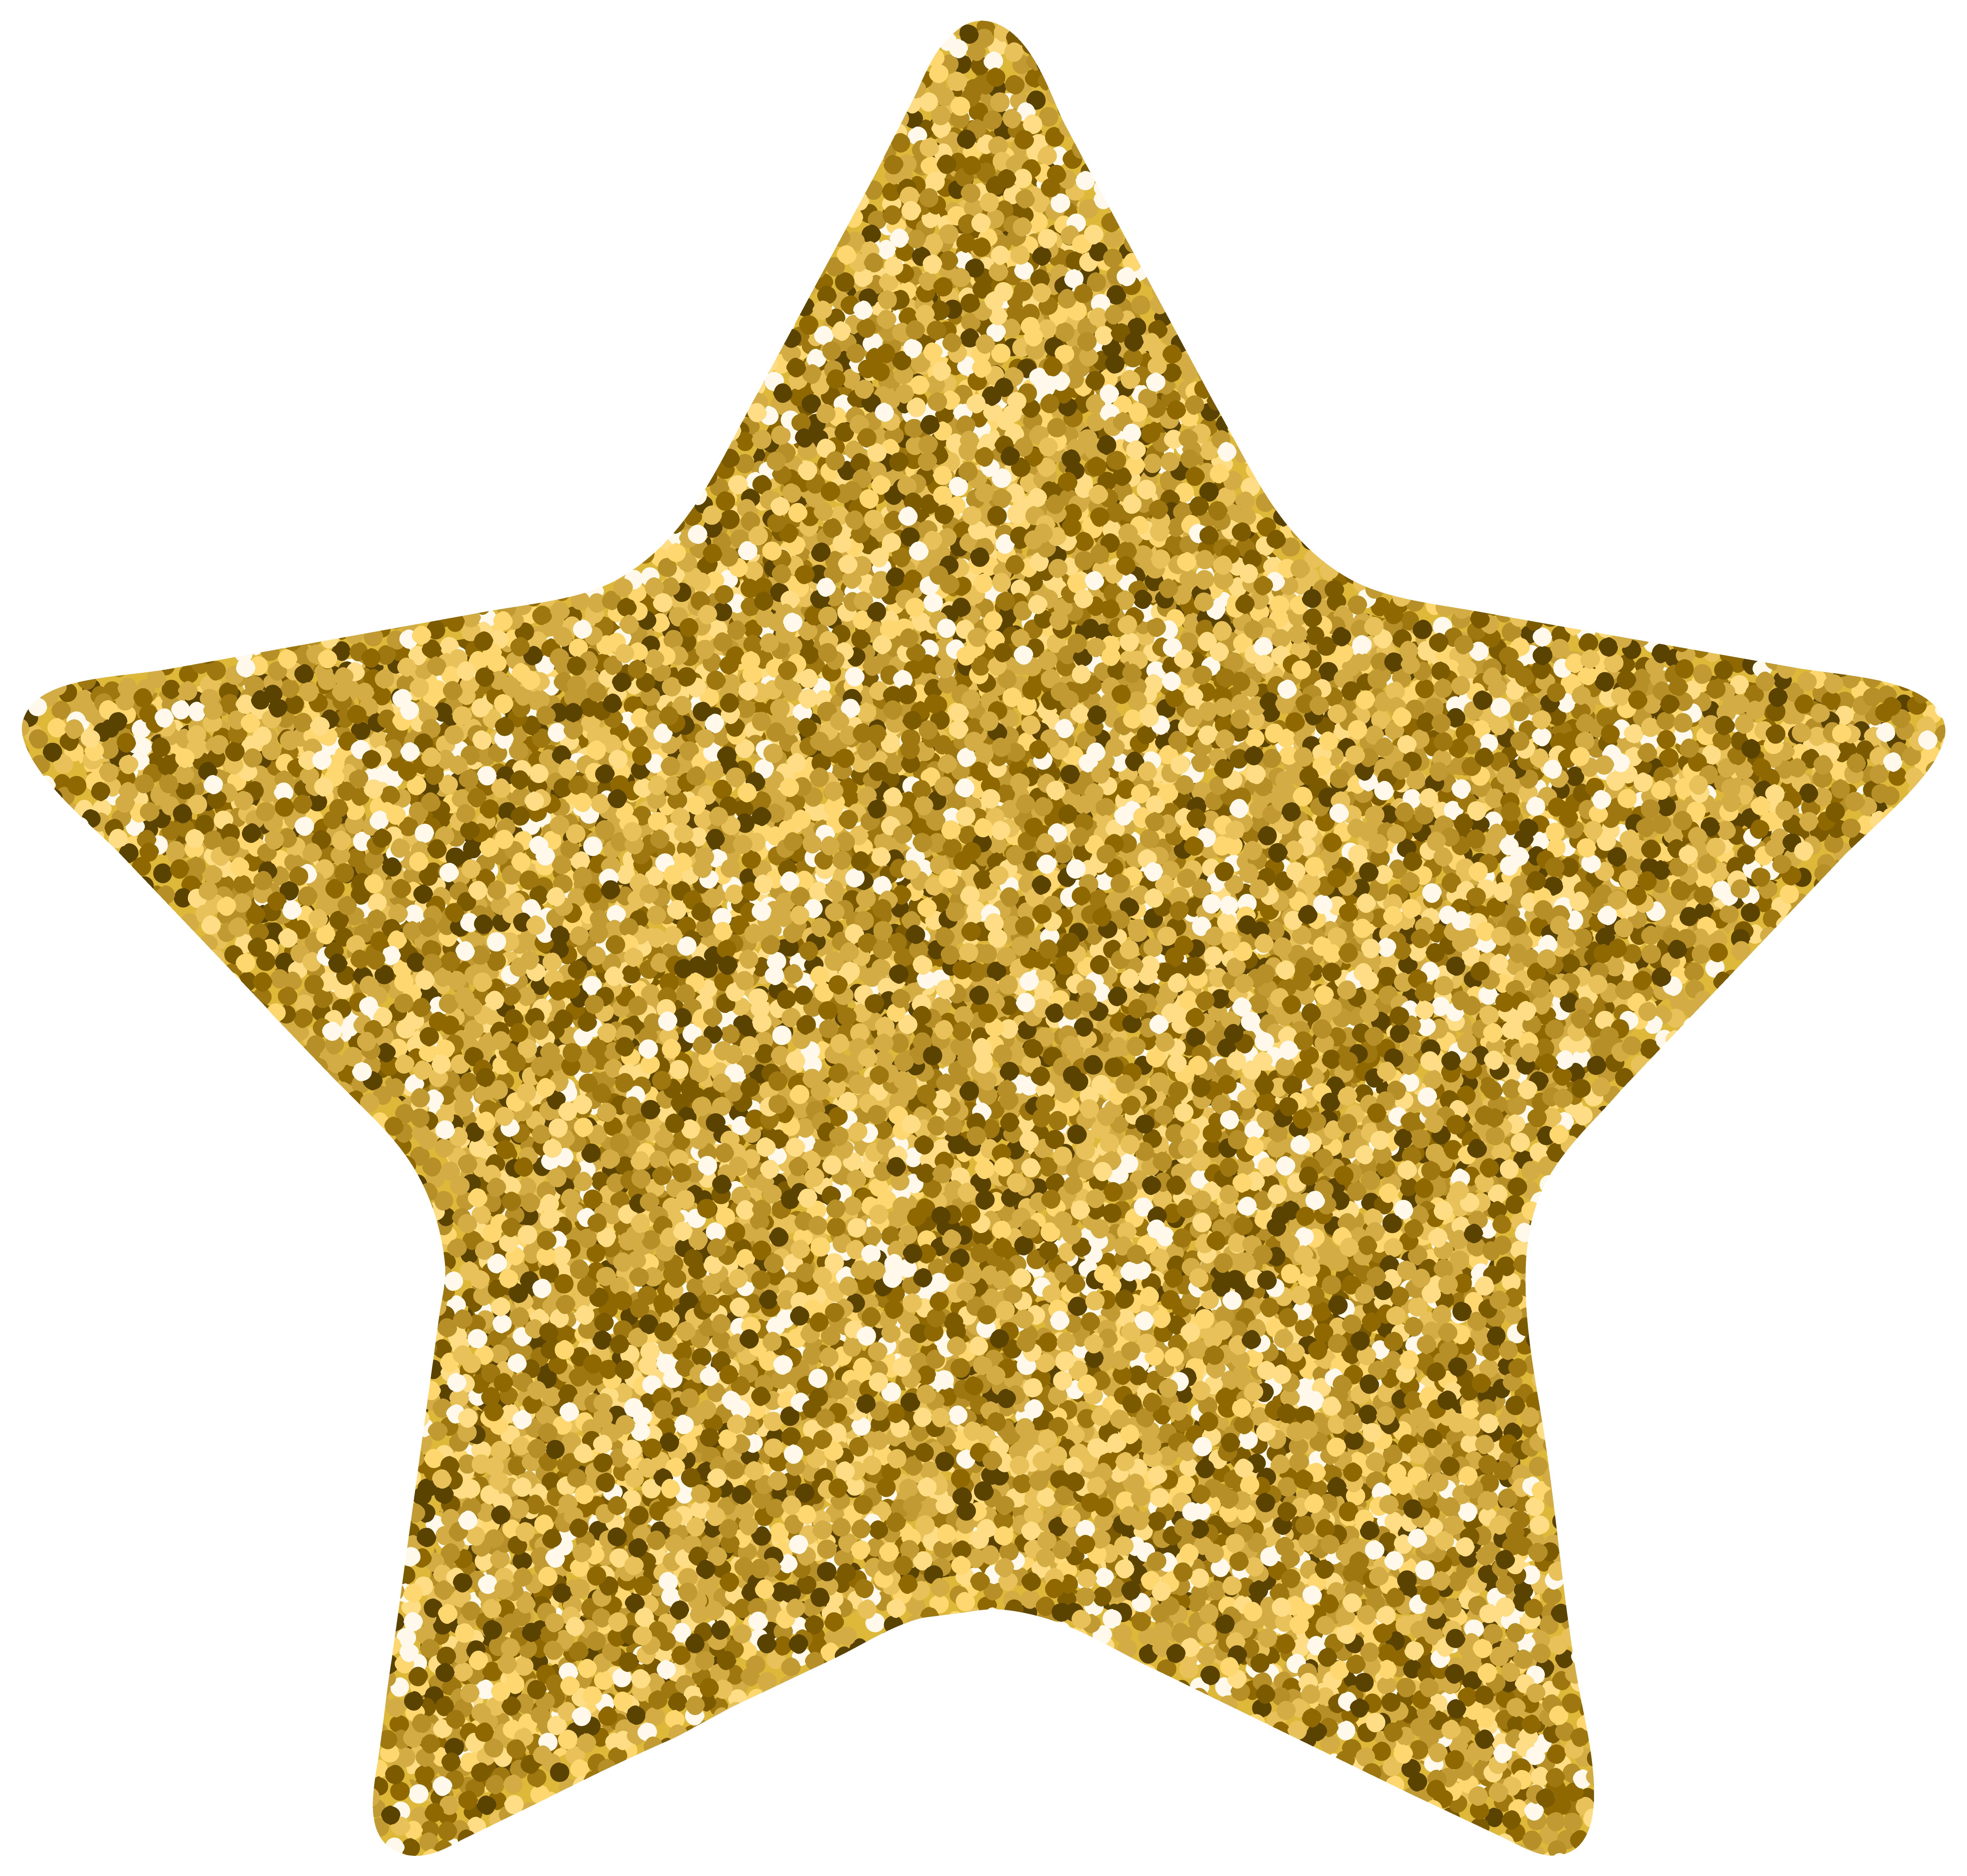 Star Decor Gold Clip Art Image.